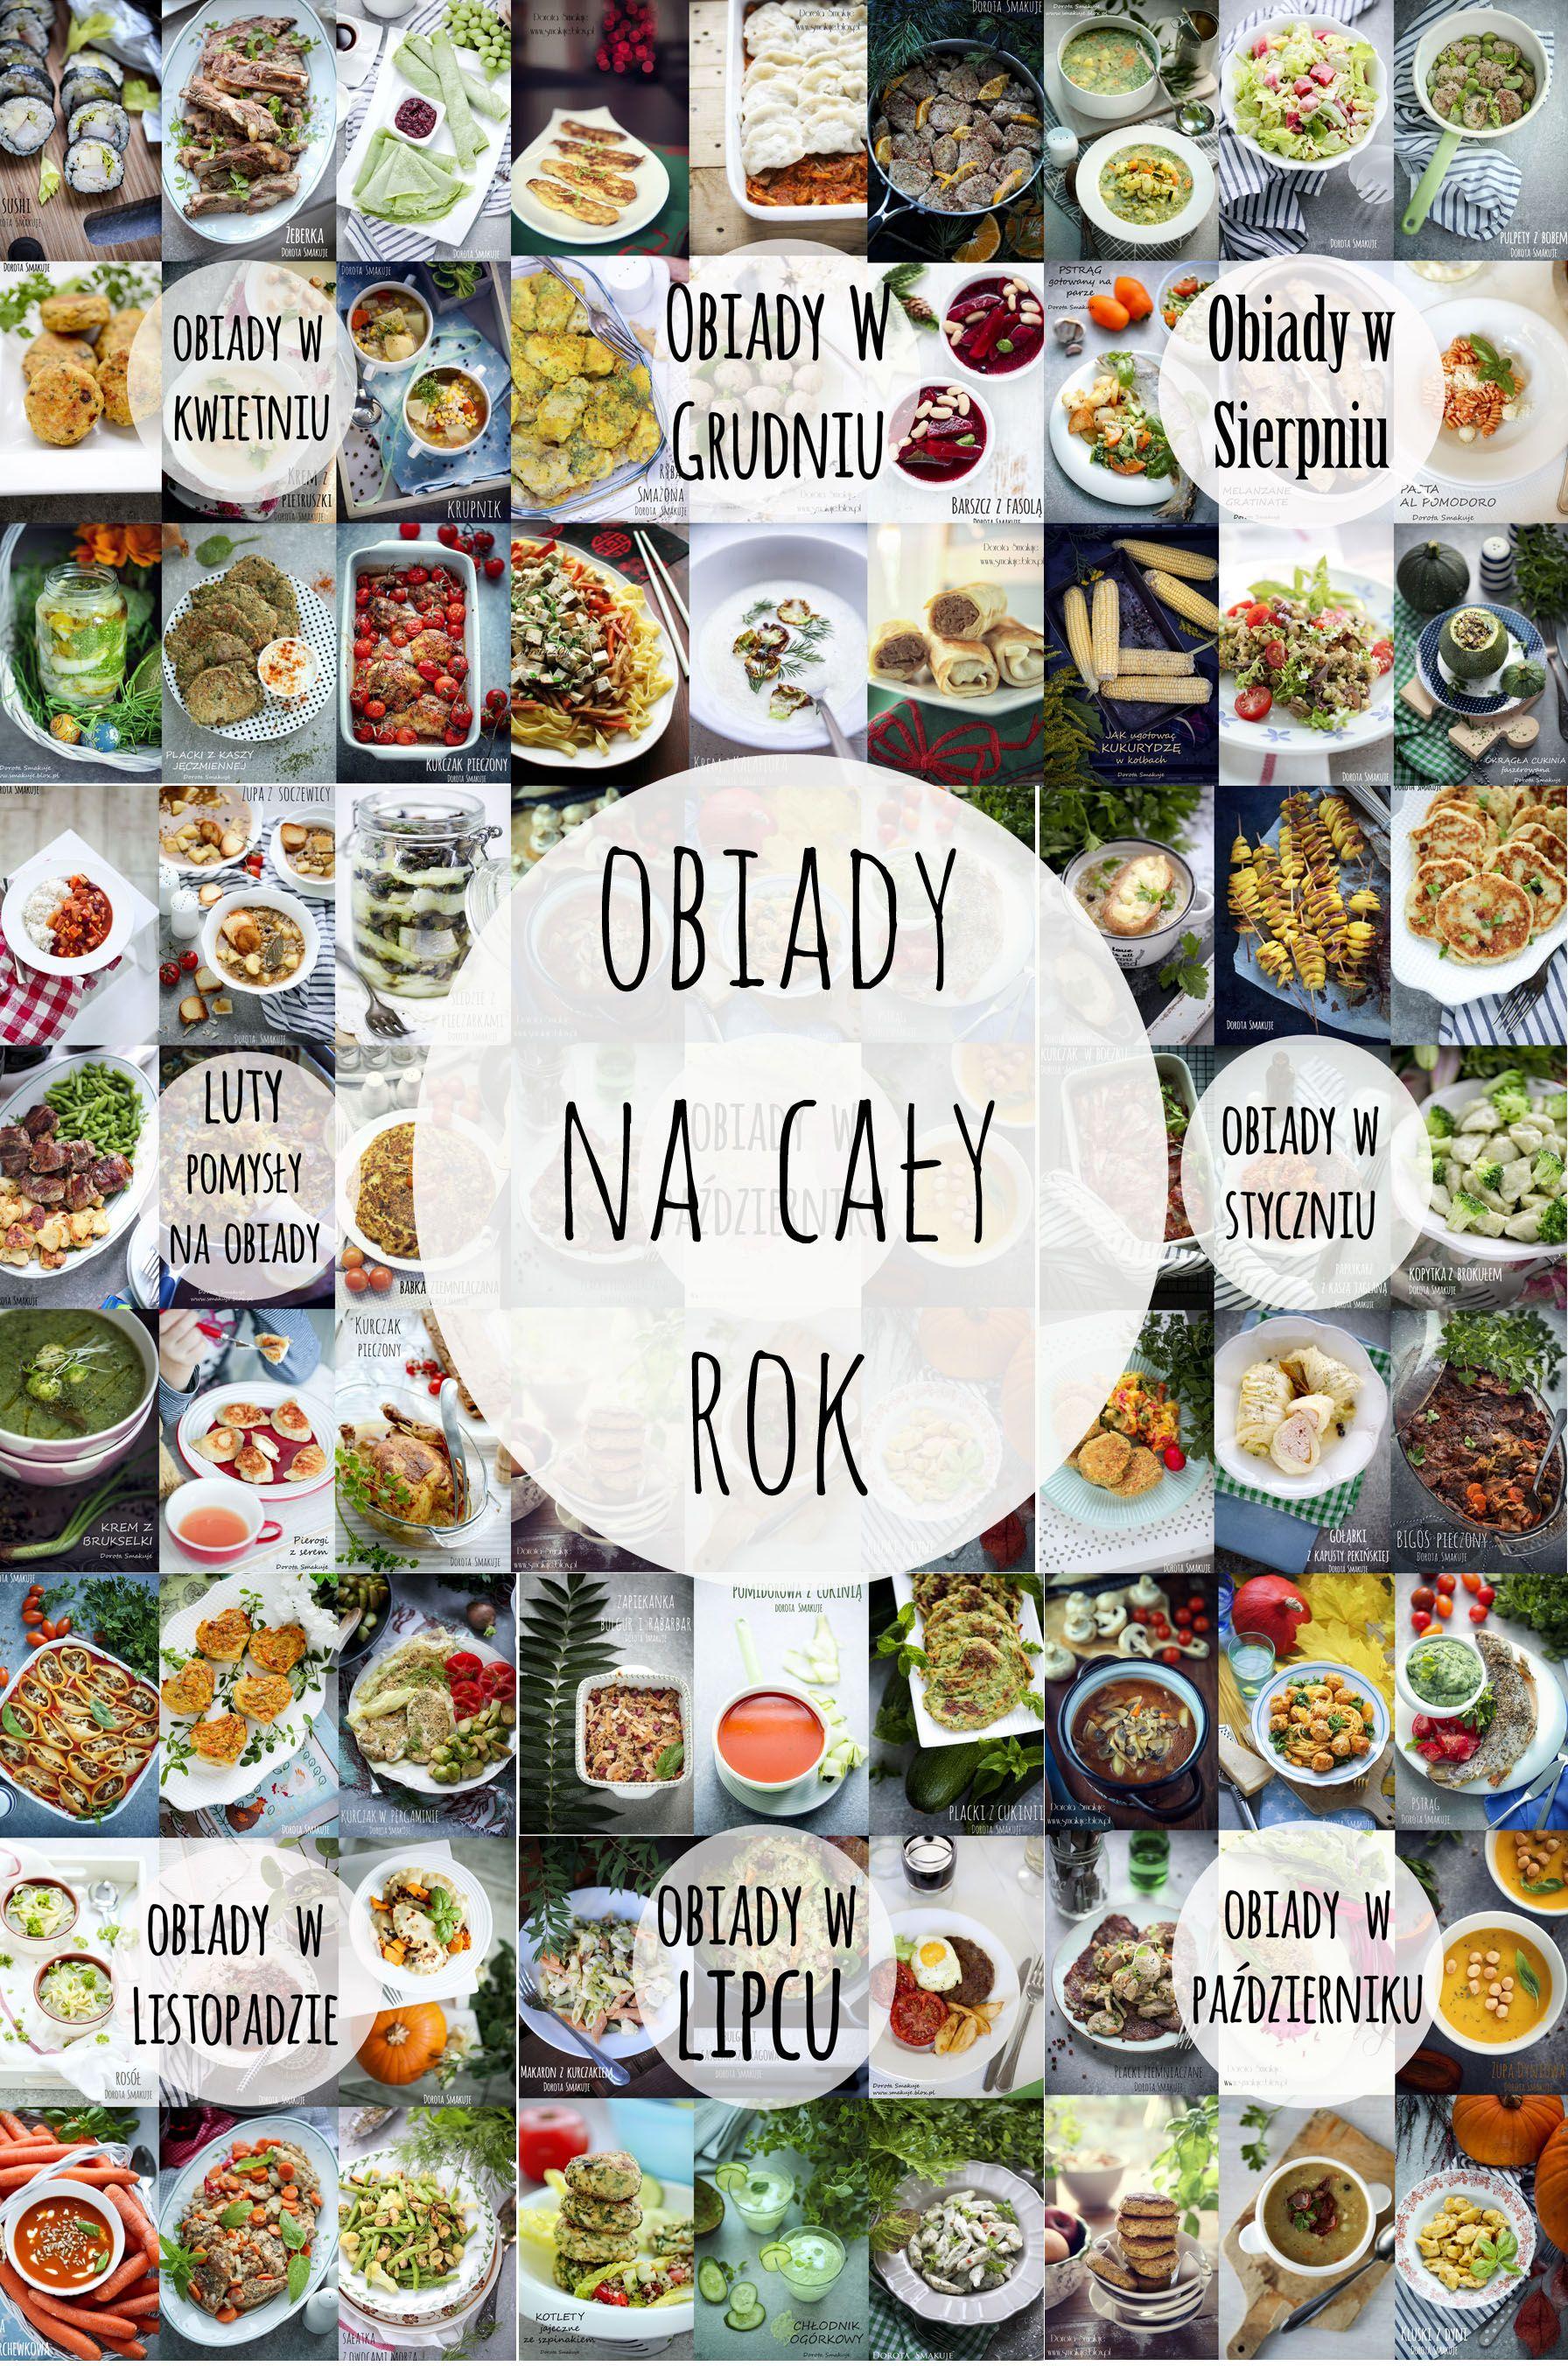 Strona Glowna Blox Pl Helathy Food Healthy Recipes Food And Drink